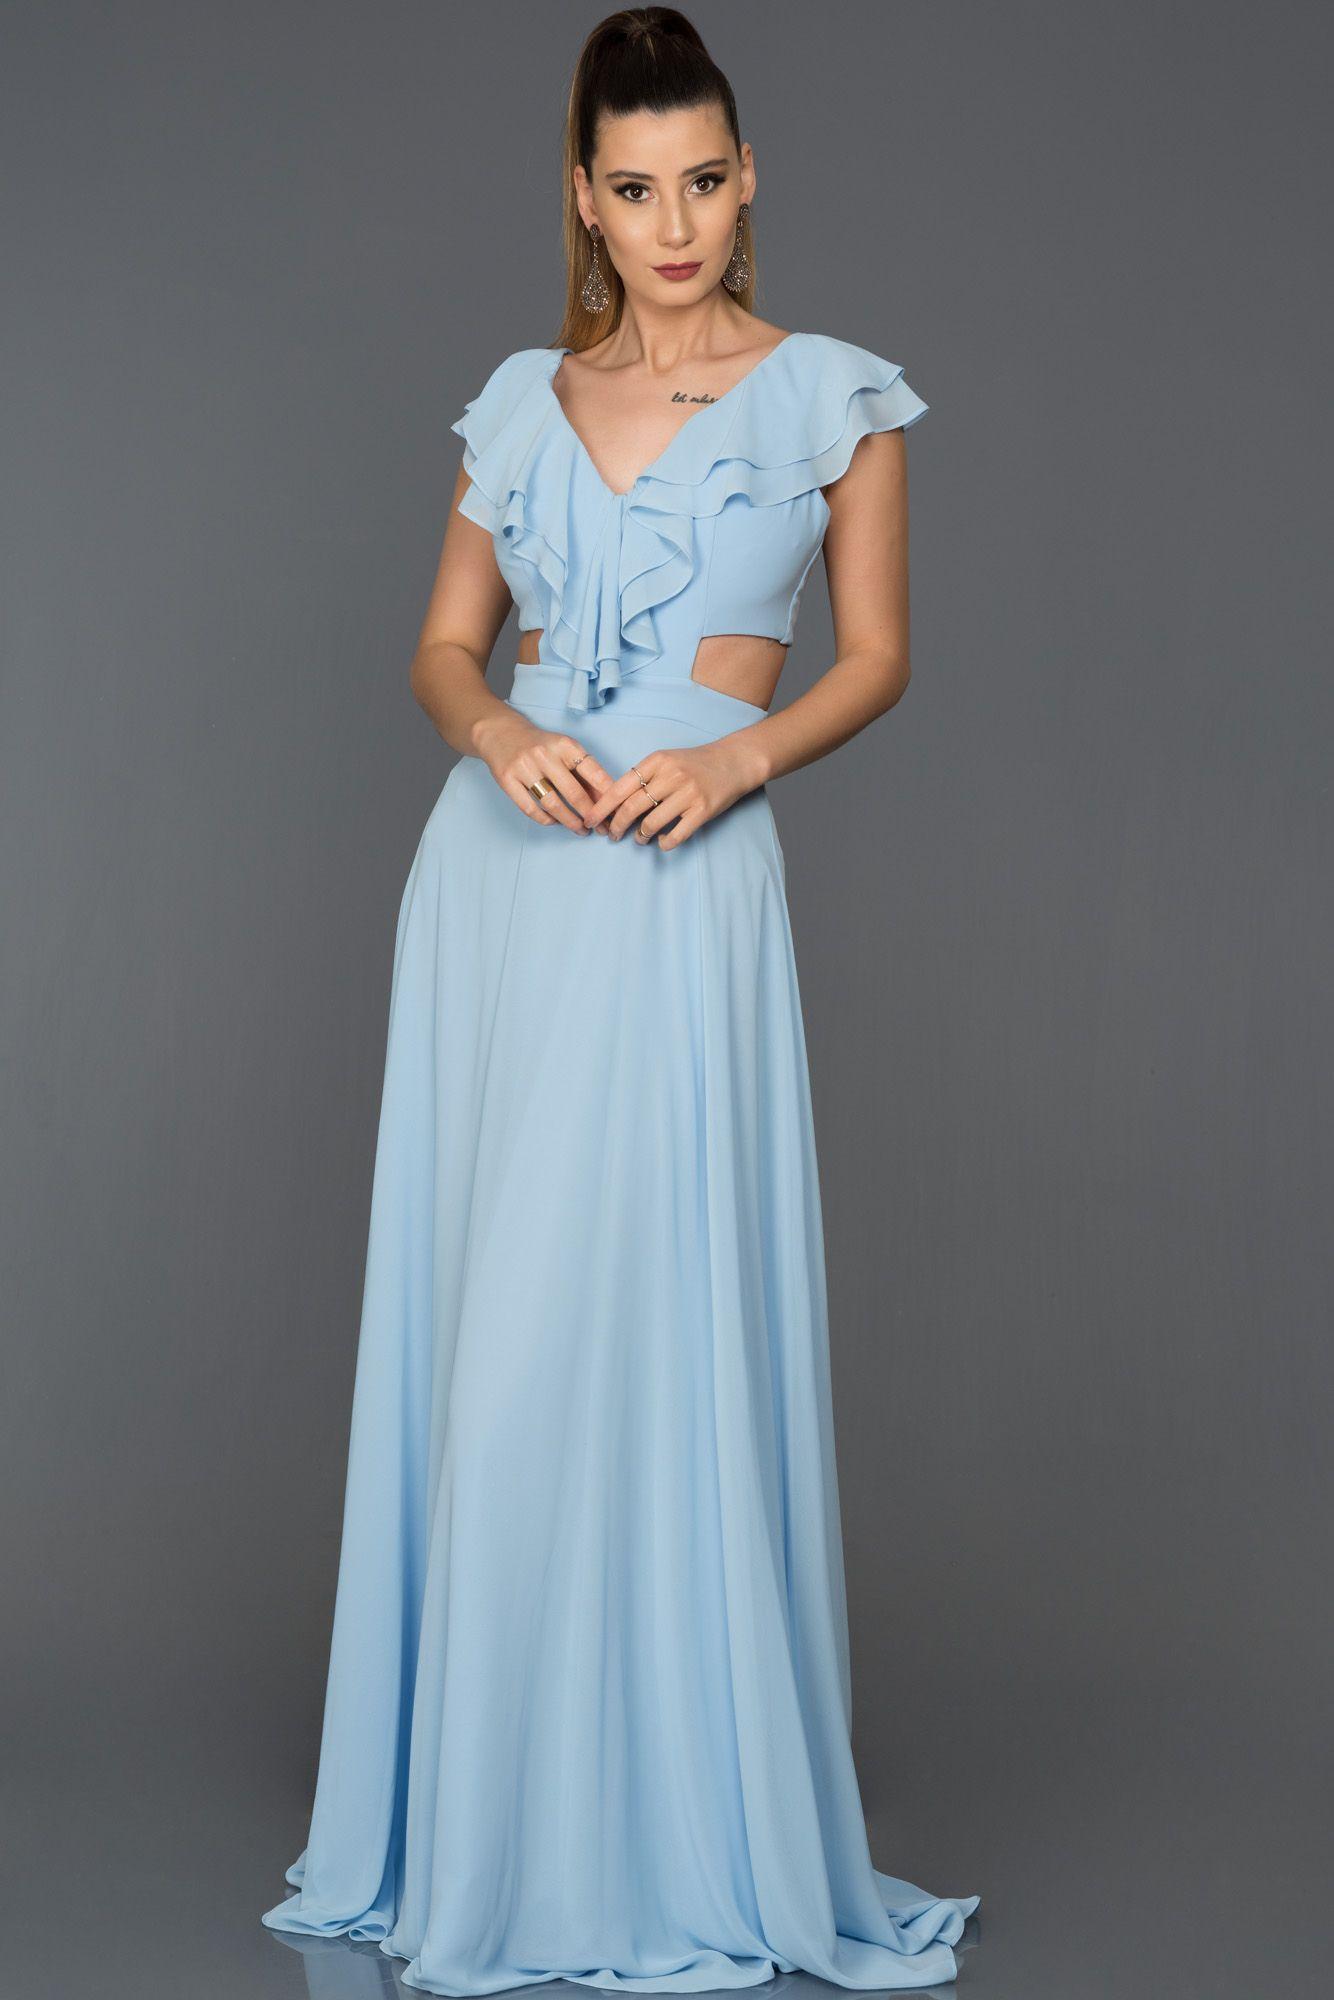 Mavi V Yaka Sifon Abiye Elbise Abu072 Elbise Maksi Elbiseler The Dress